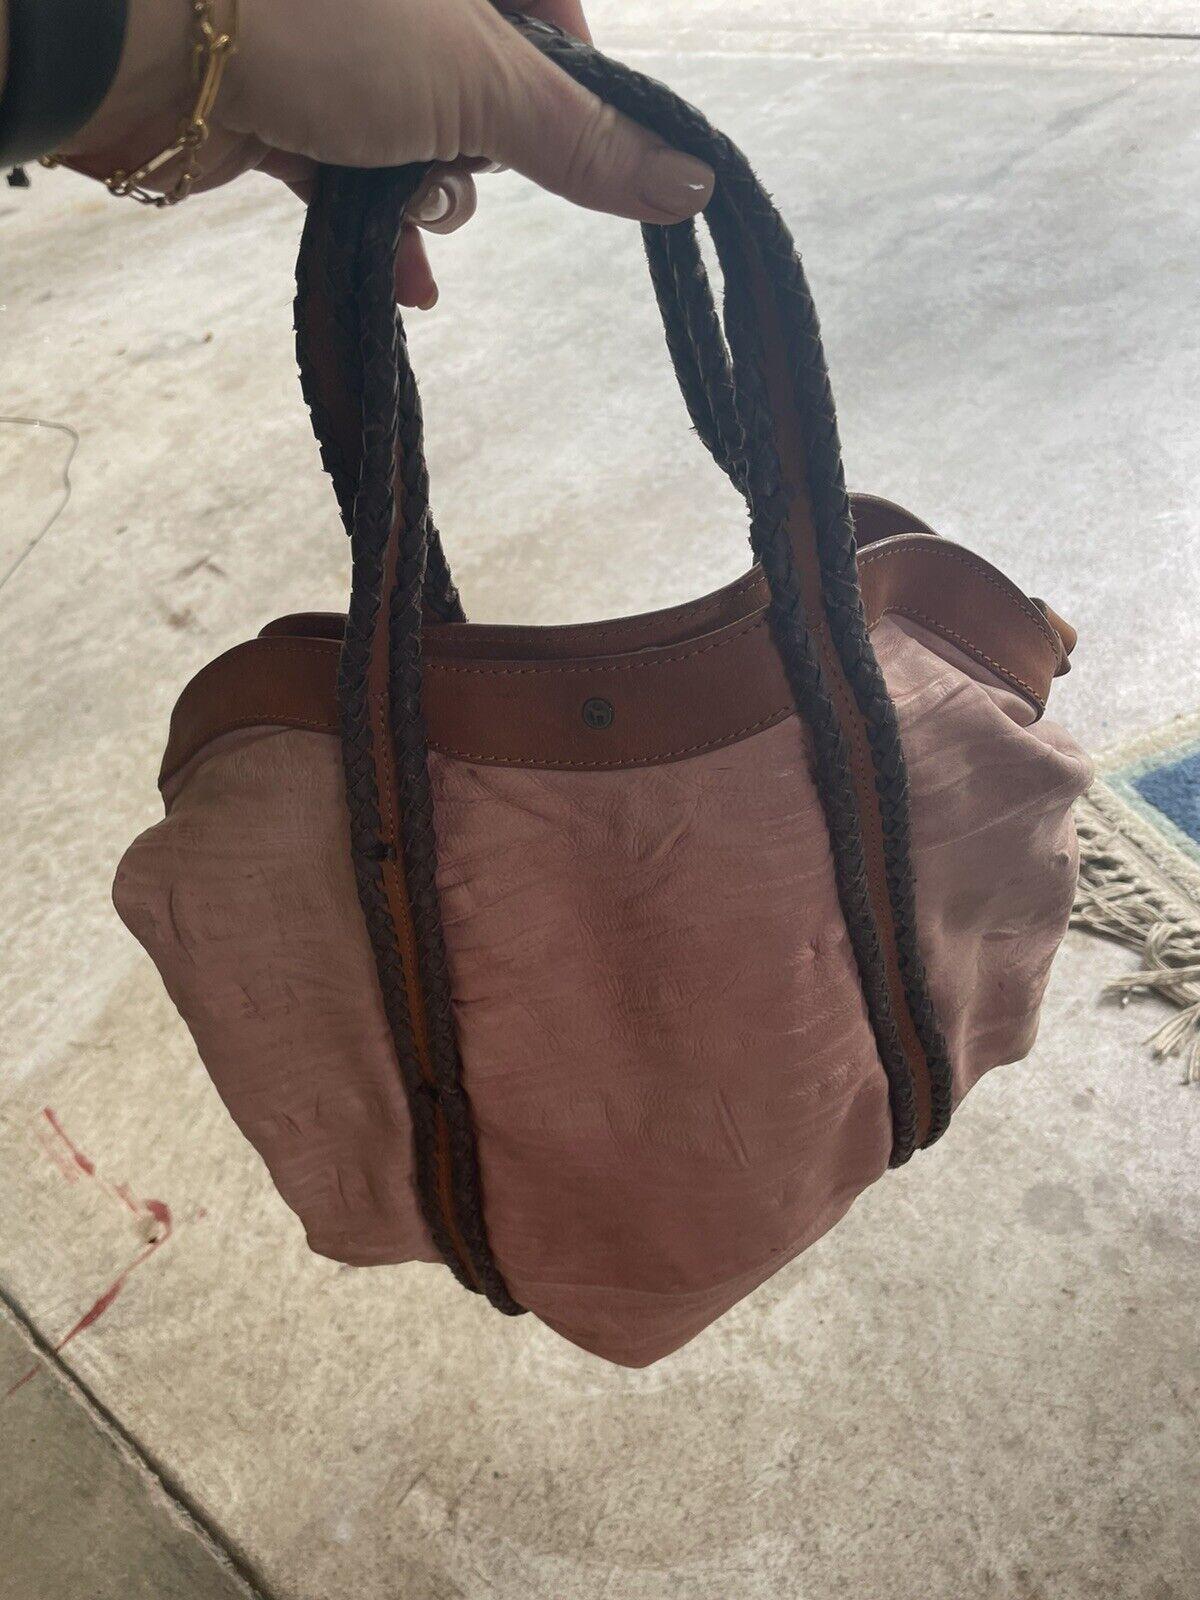 holding horses Leather Dusty Pink bag - image 7